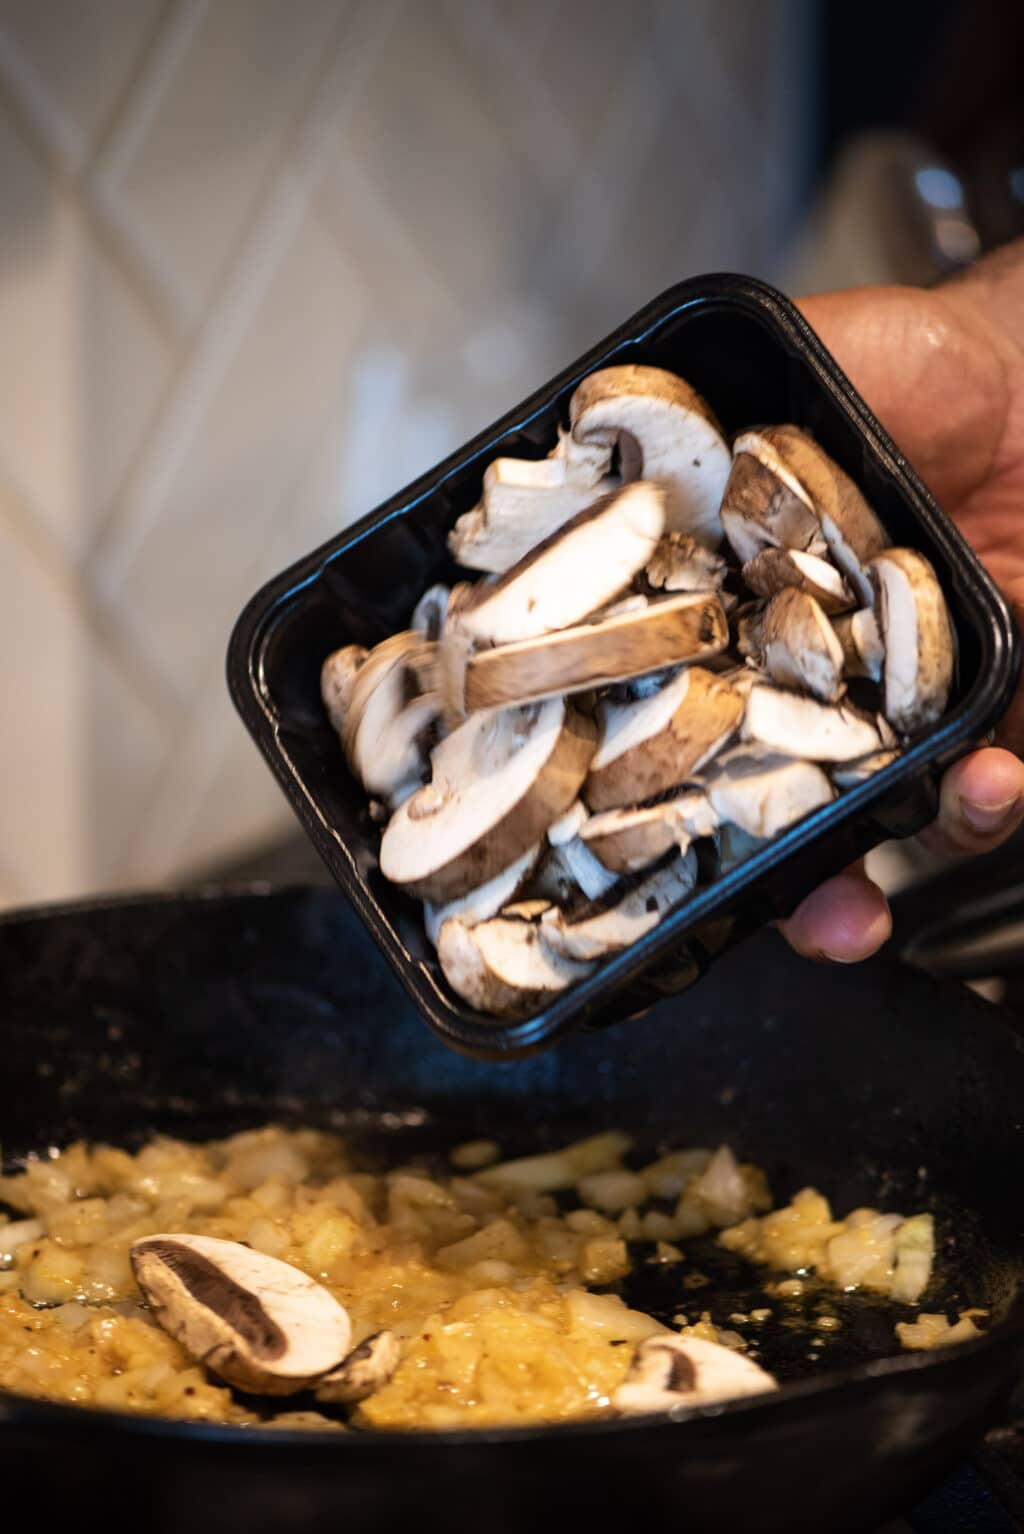 Adding fresh mushrooms to a skillet